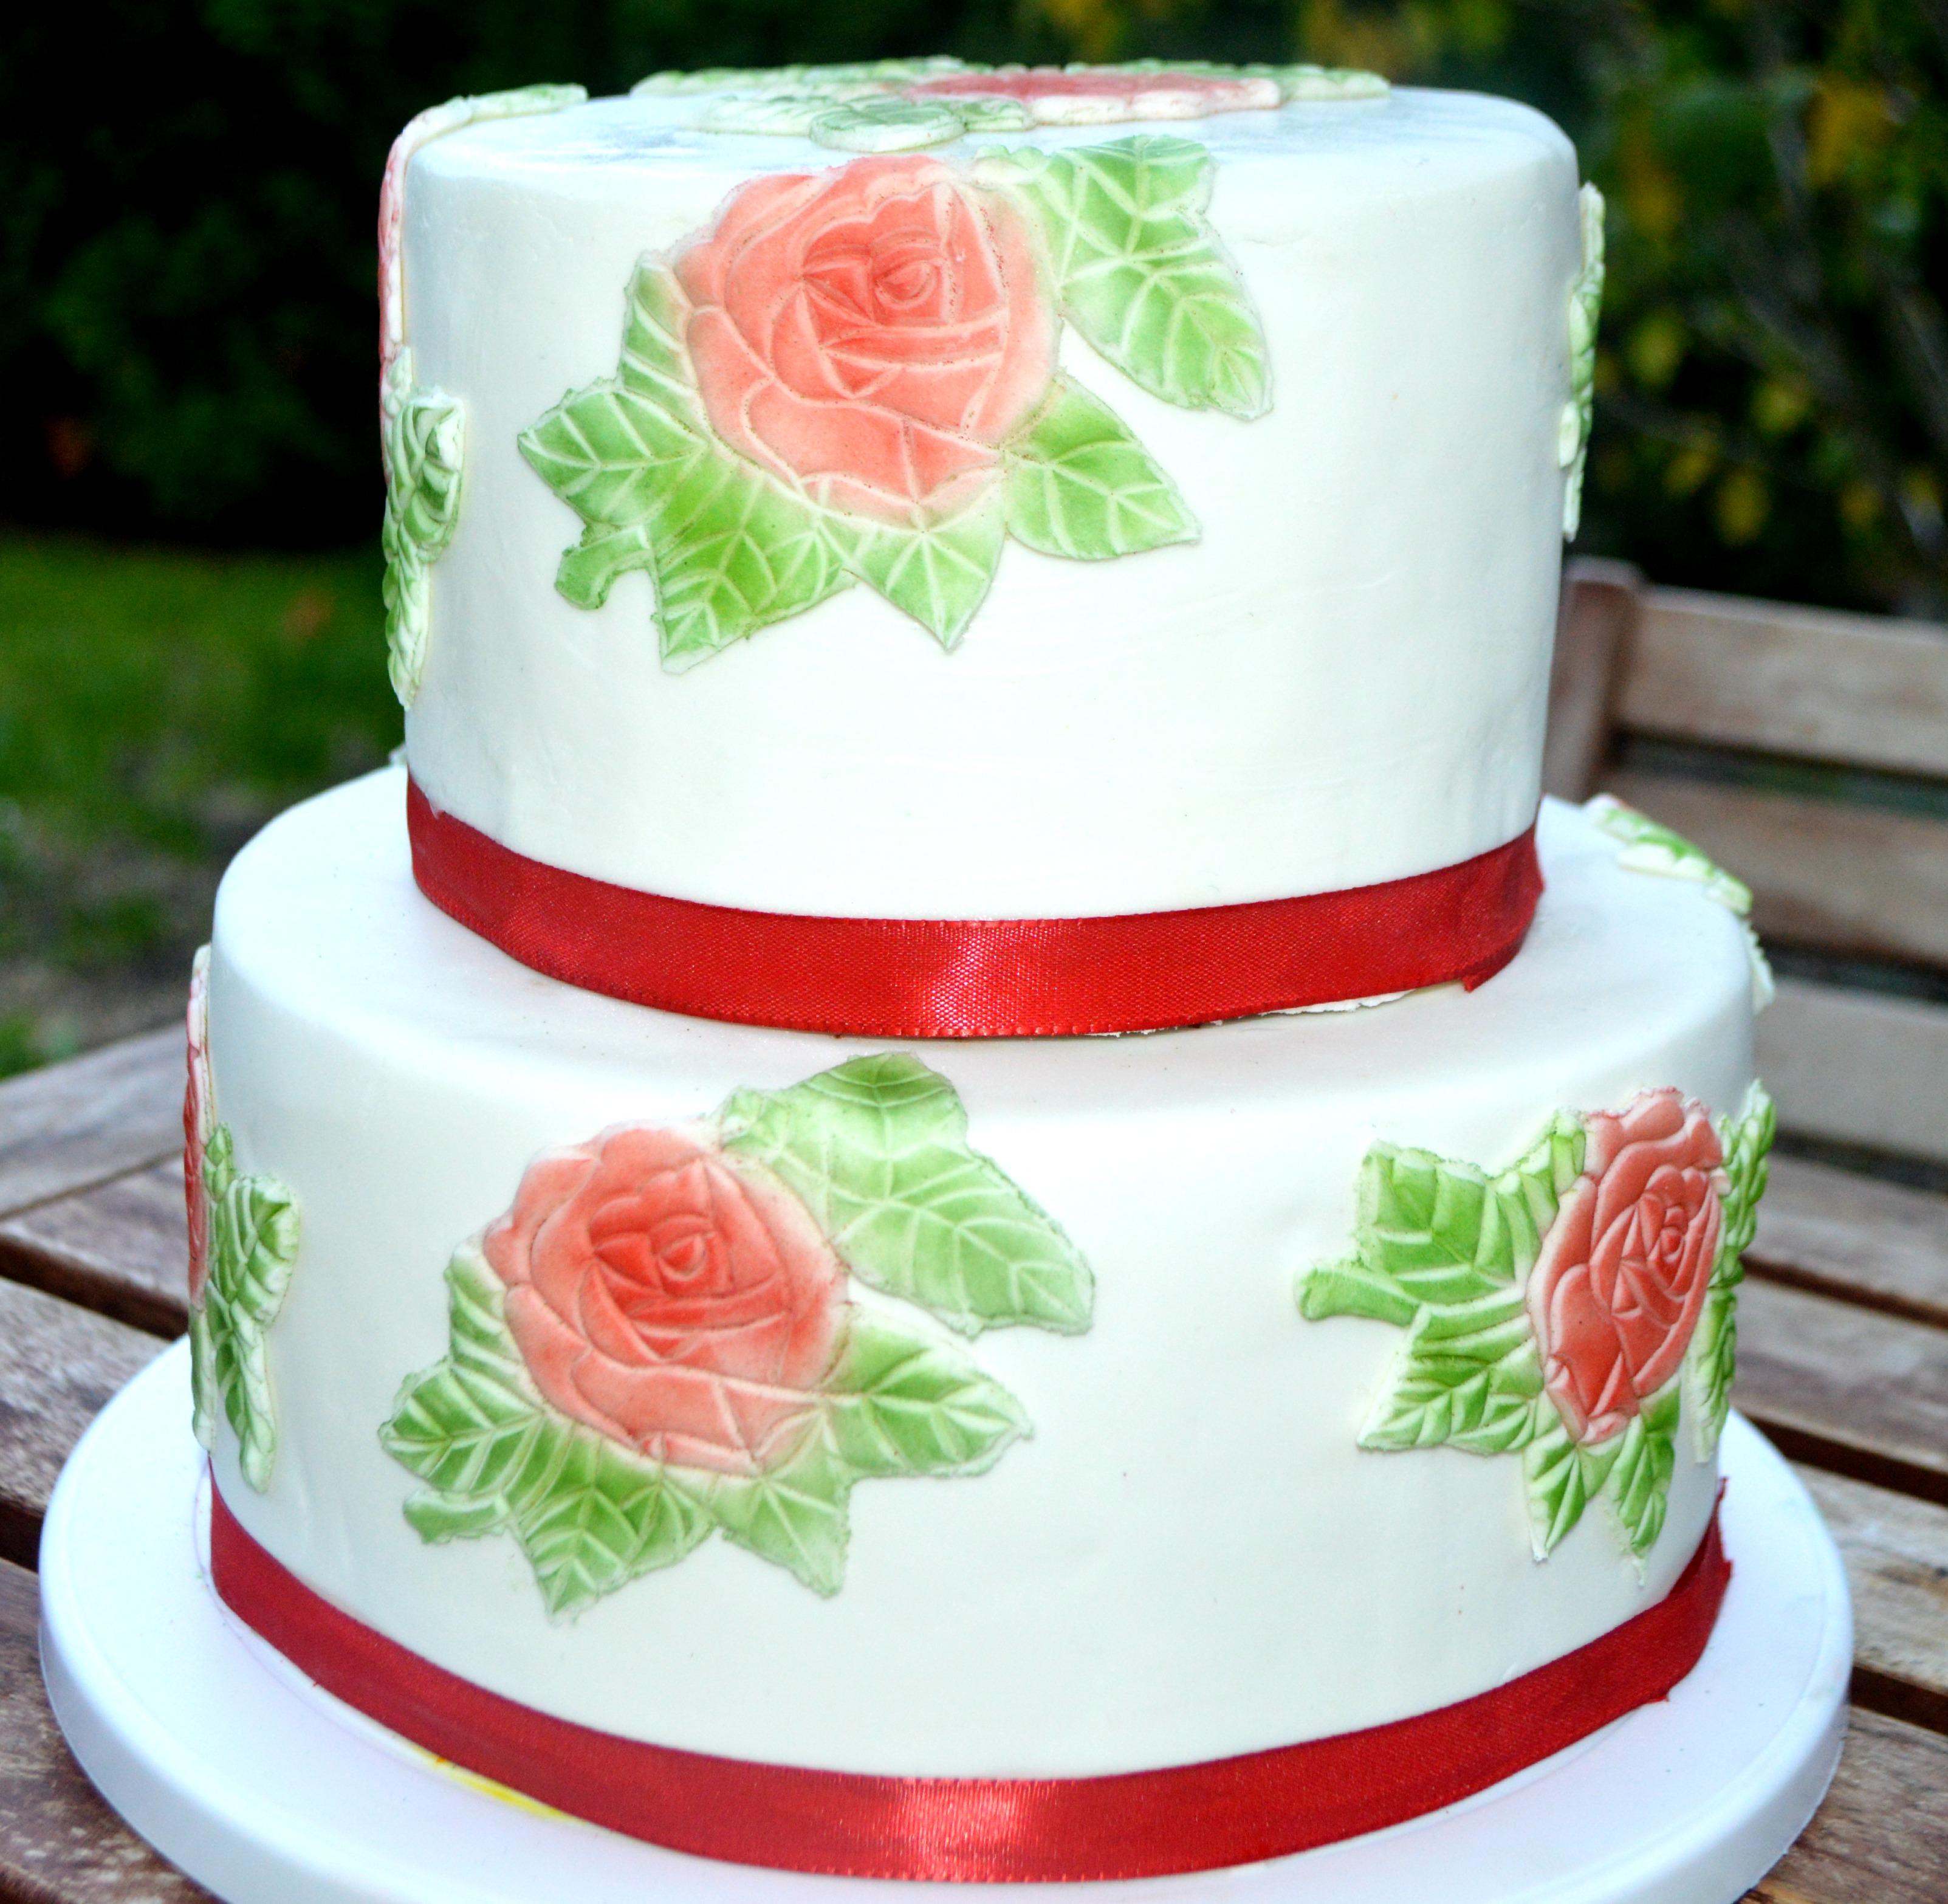 2 Stockige Torte Mit Fondant Torte Mit Rosen Tortenkreation Shs